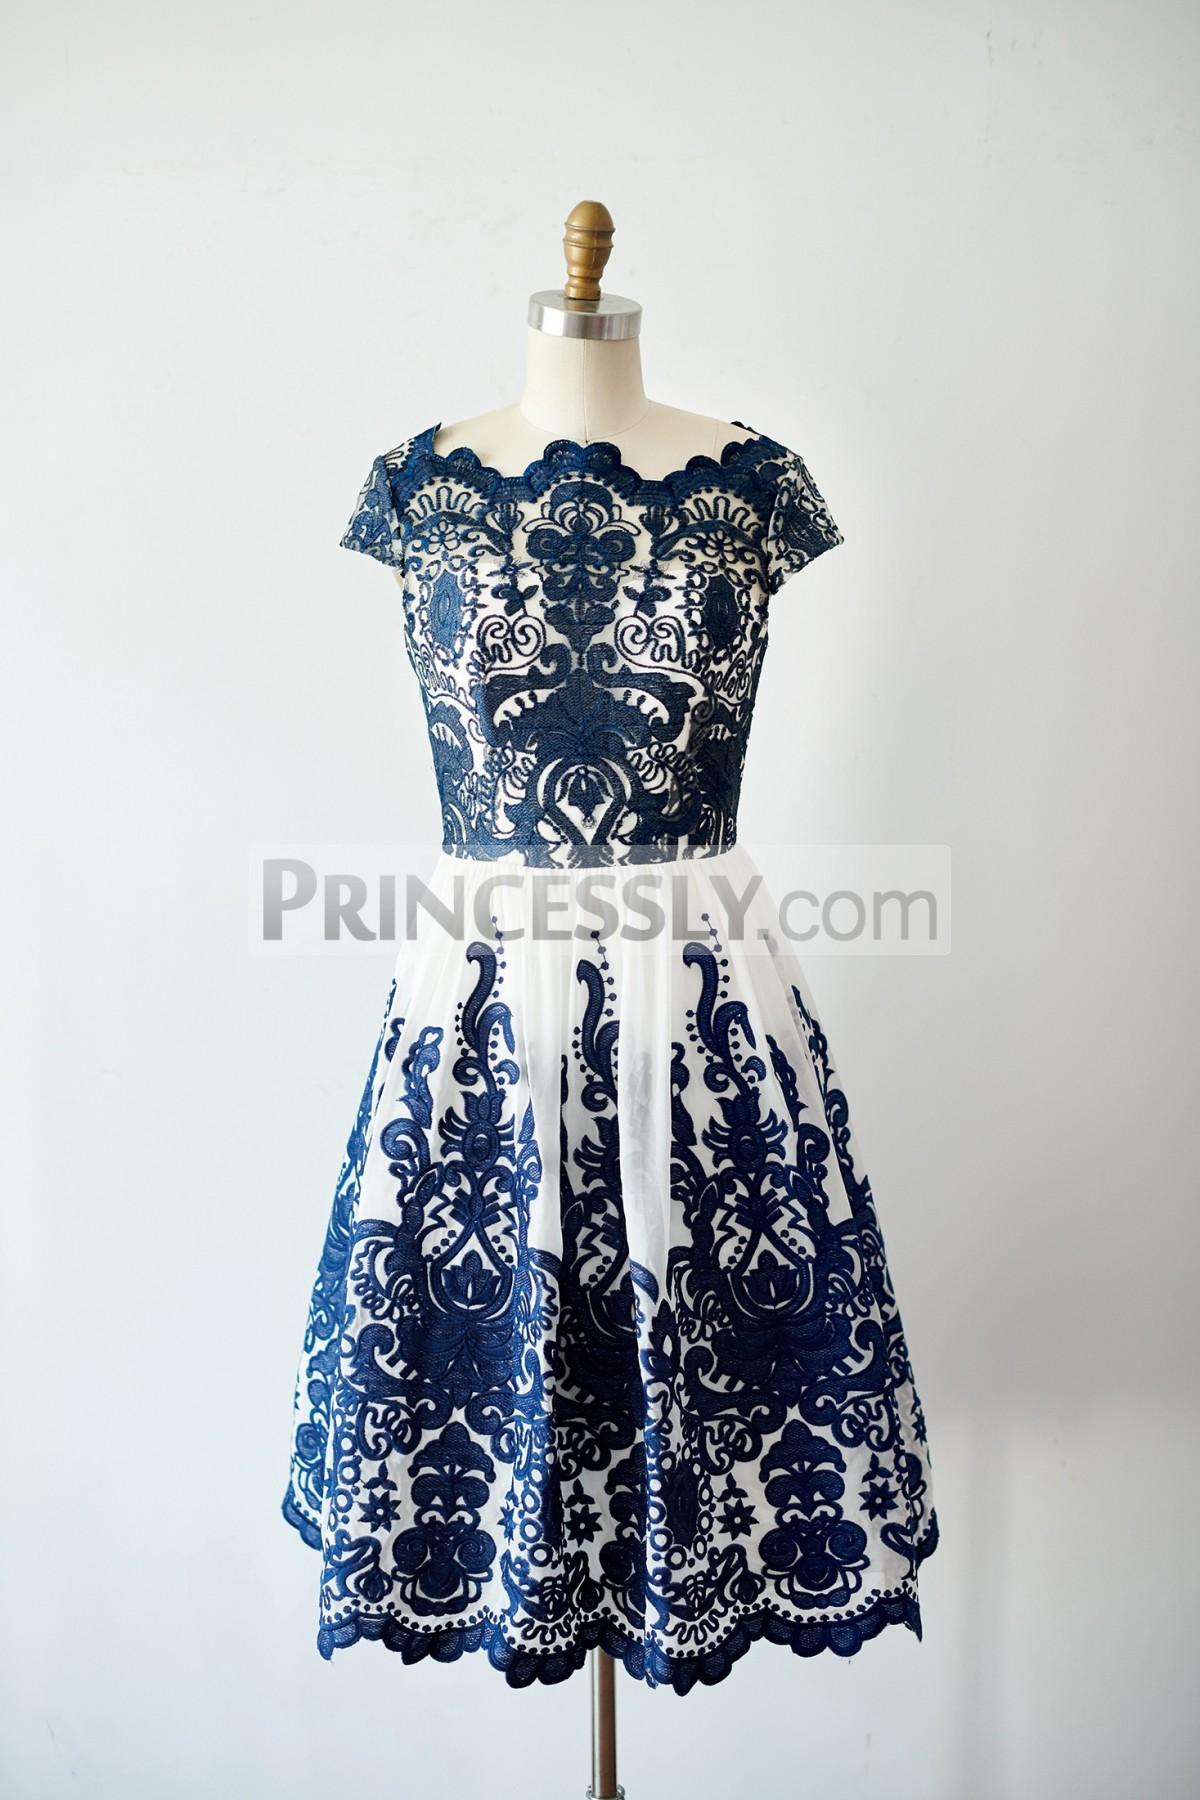 Princessly.com-K1003818-Cap Sleeves Navy Blue Lace chiffon Wedding Bridesmaid Dress Evening Dress in Knee Length-31